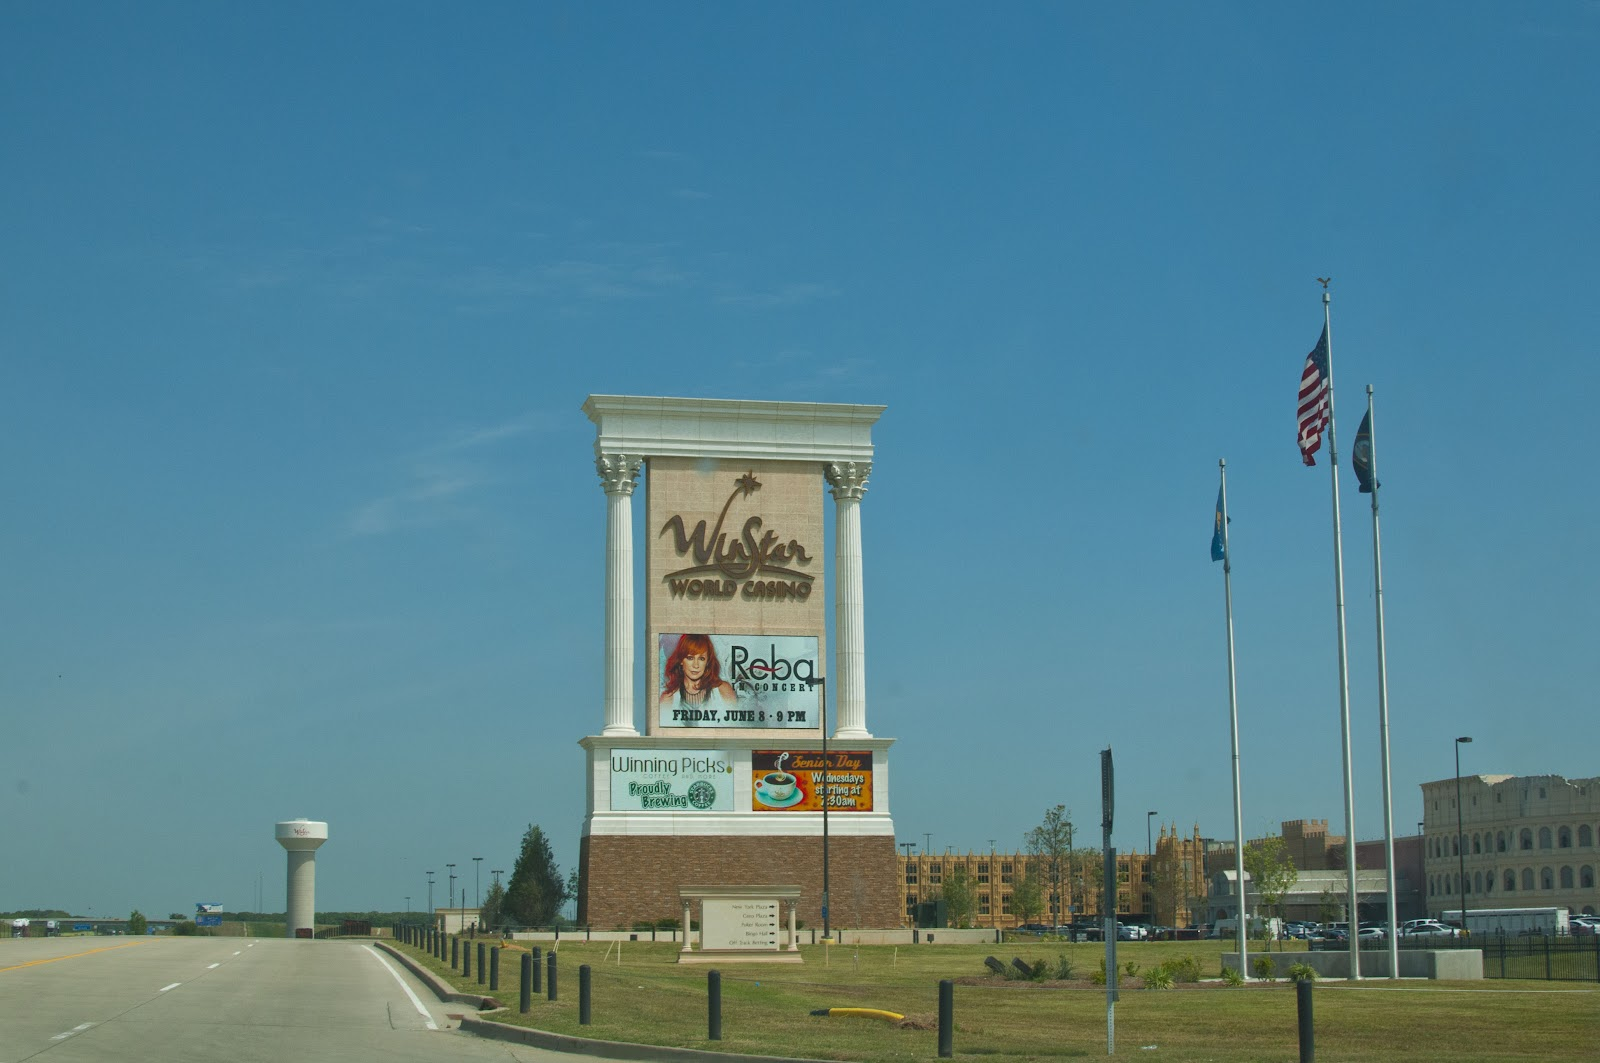 Winstar casino in okc